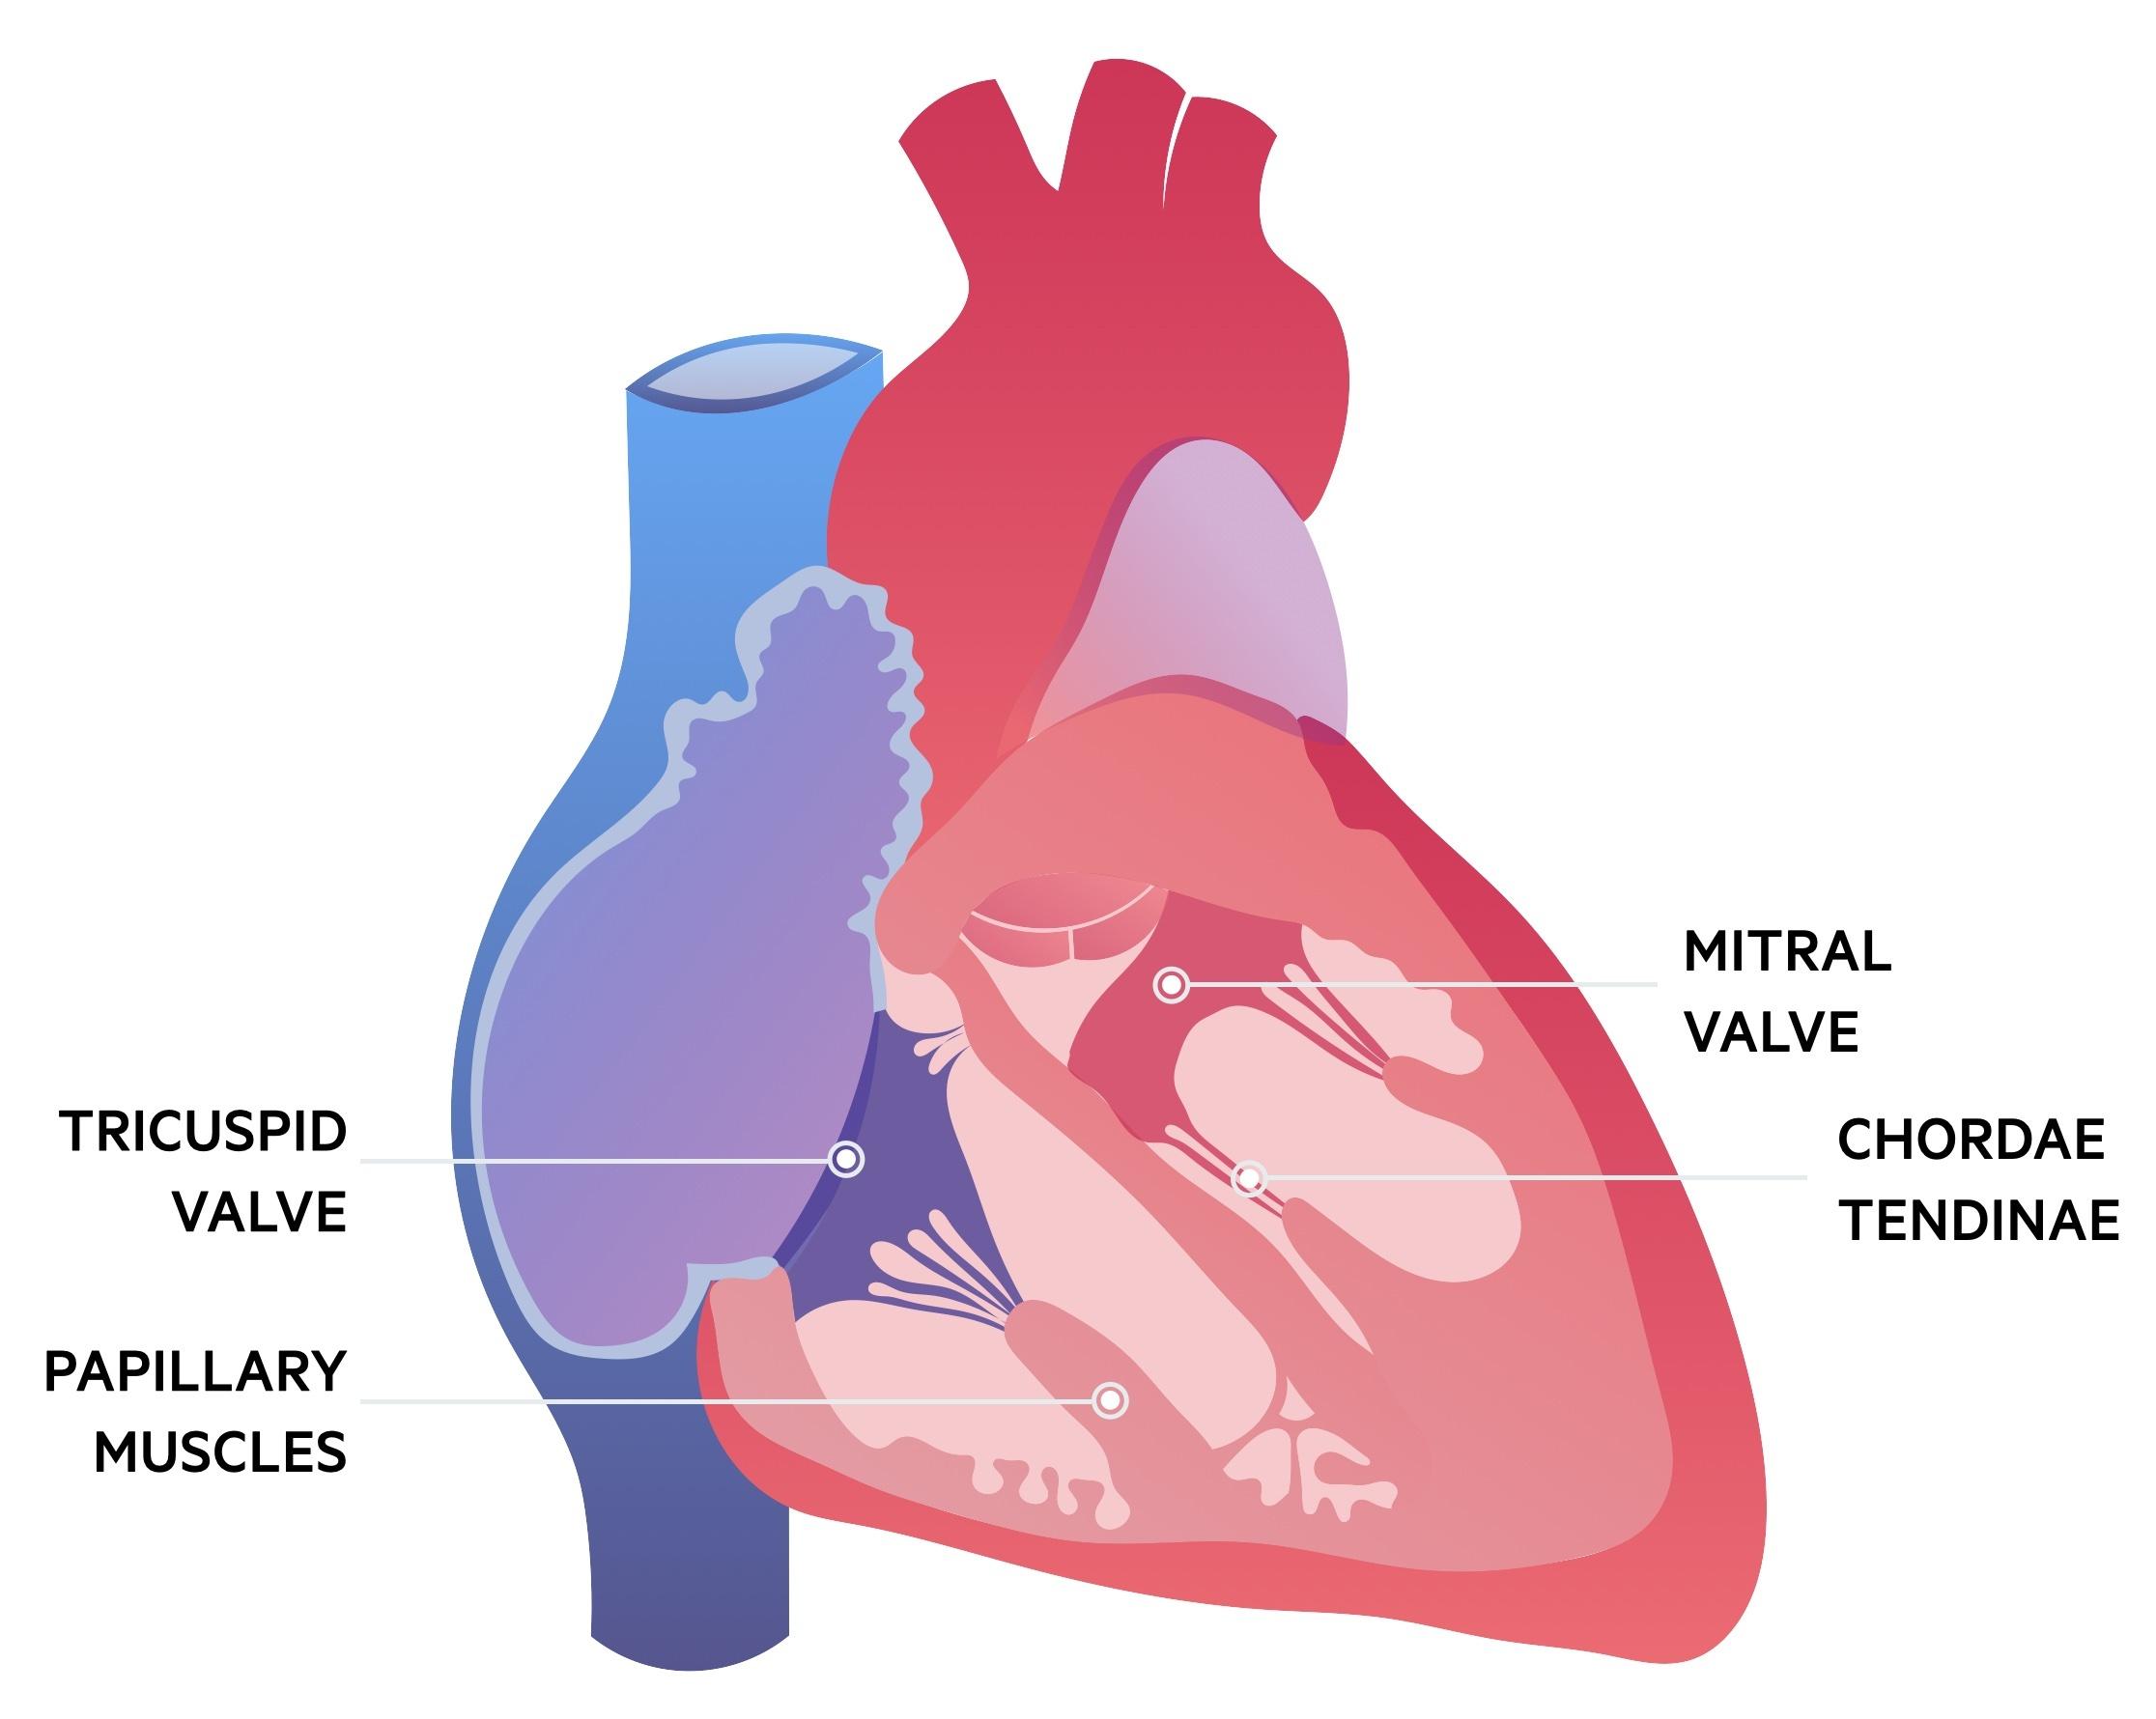 Mitral valve anatomy